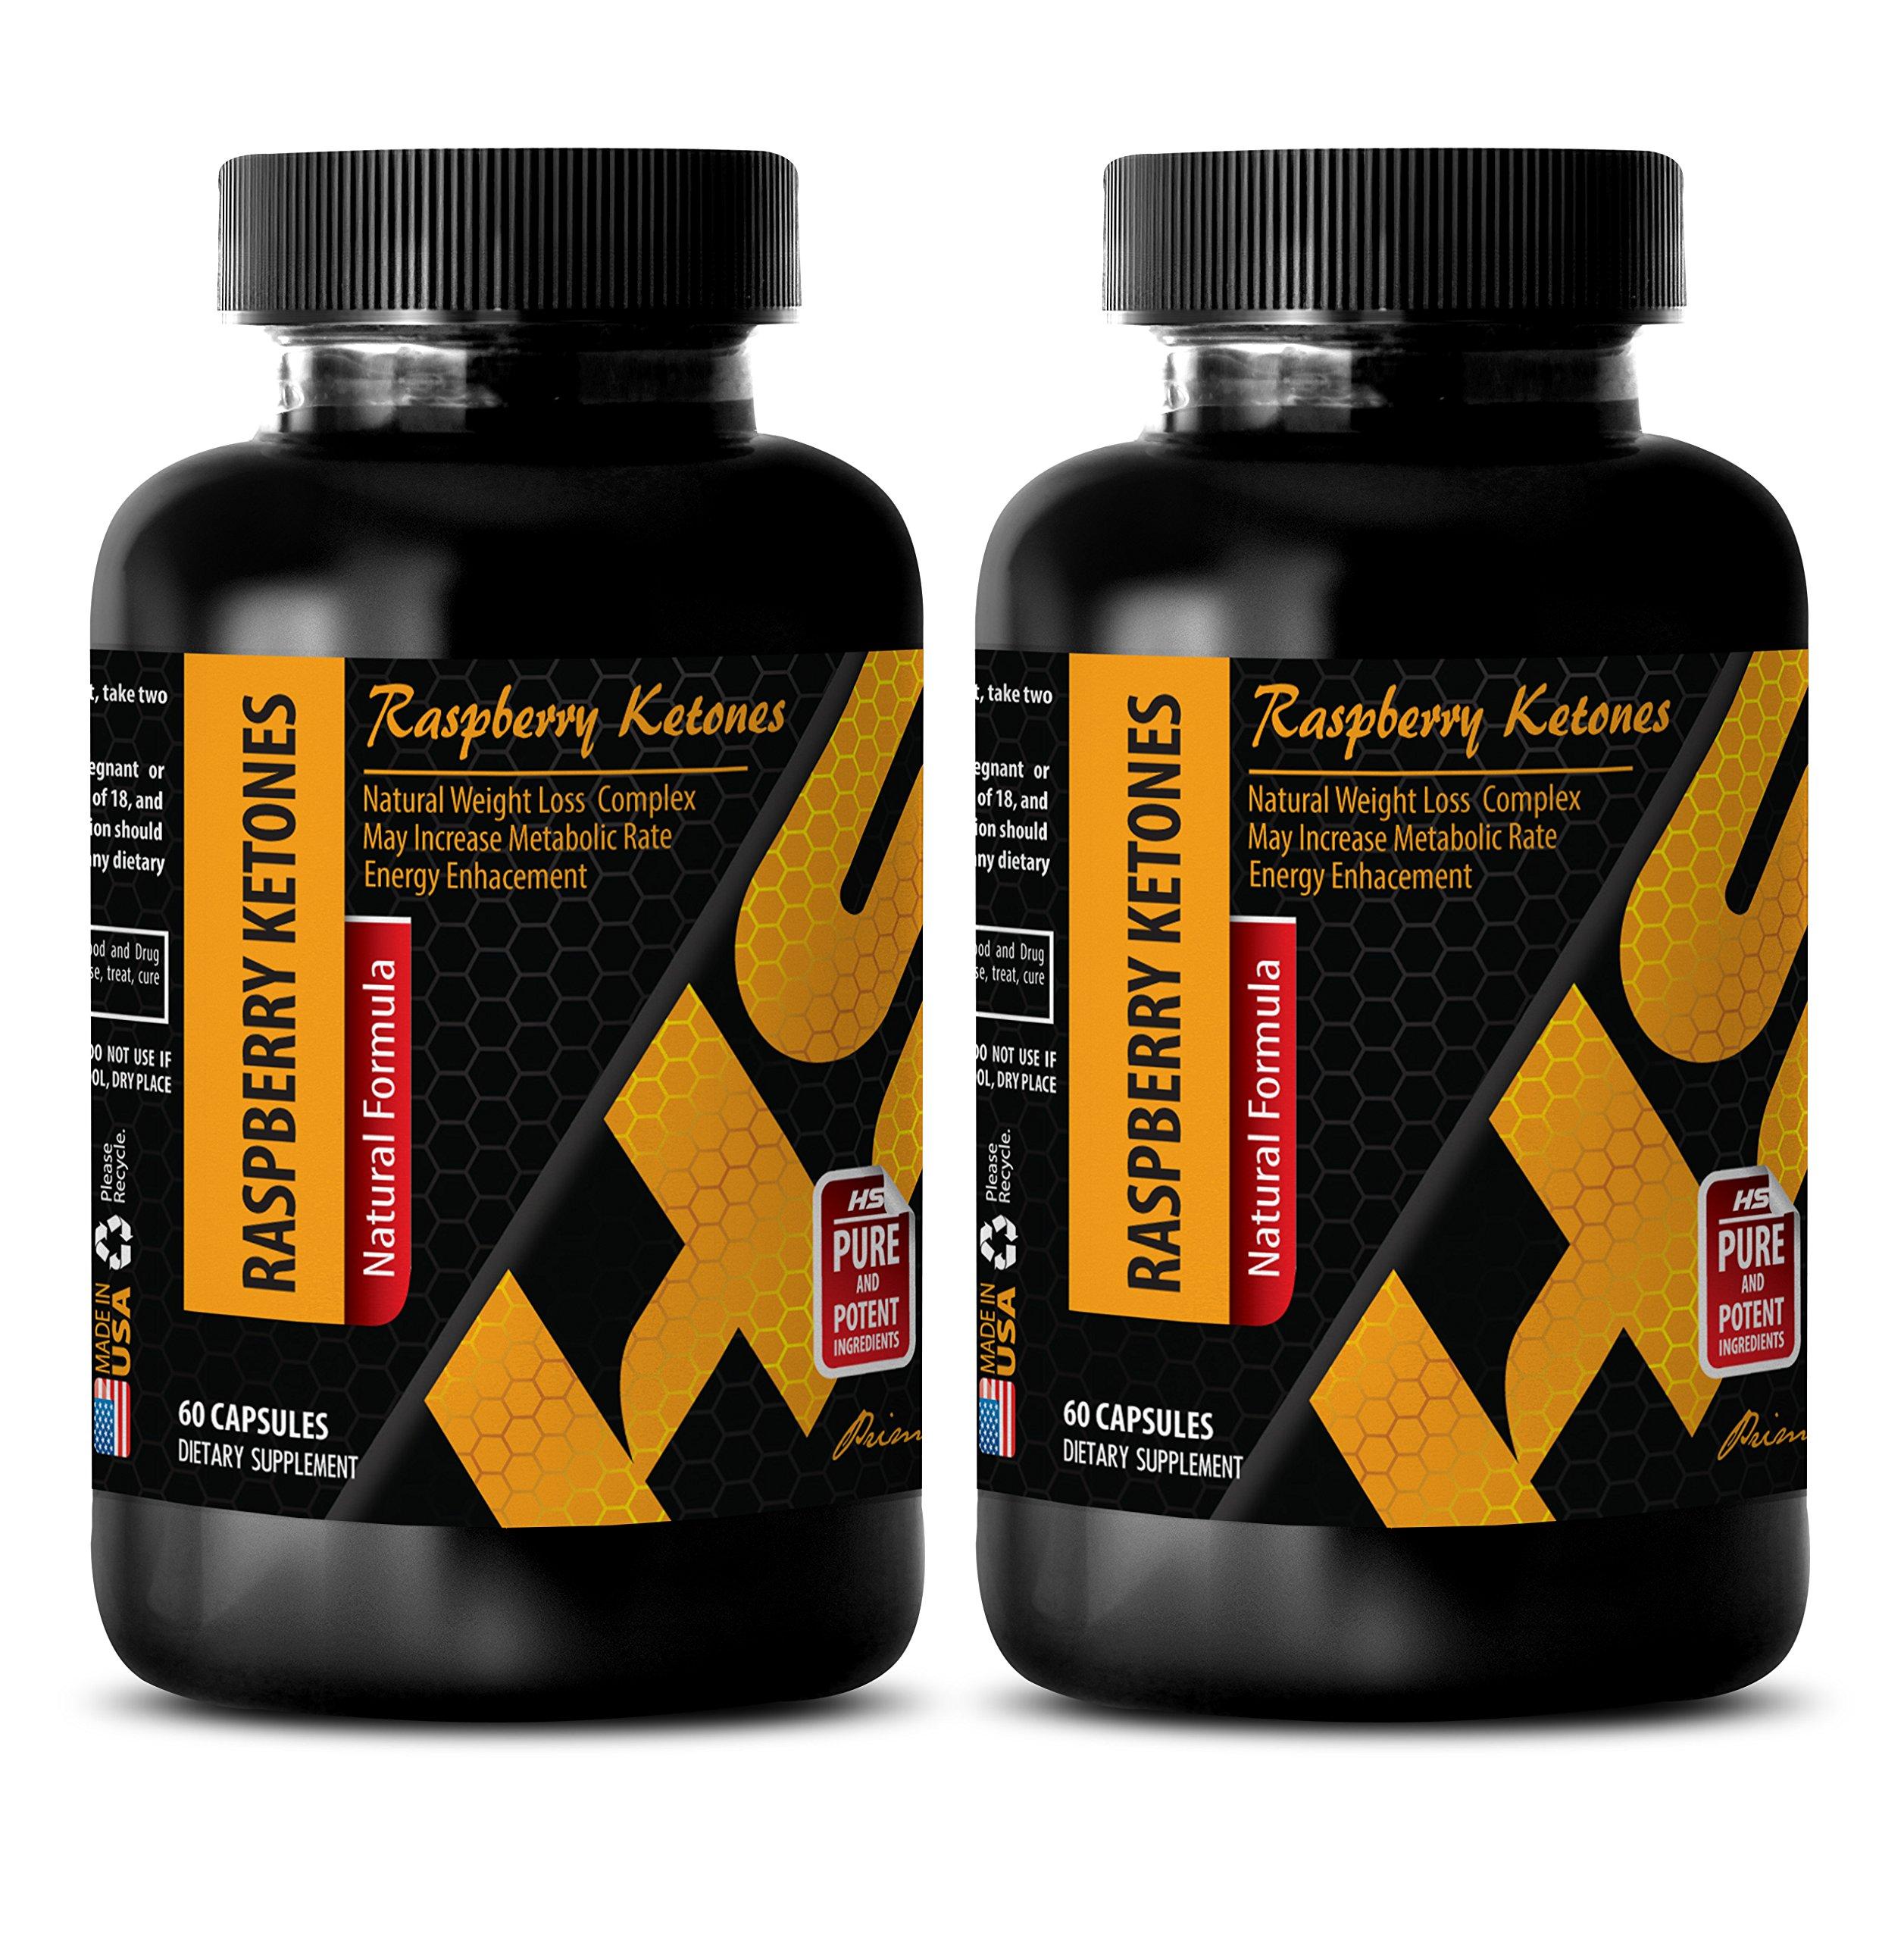 Metabolism accelerator - NATURAL RASPBERRY KETONES LEAN 1200MG - African mango plus - 2 Bottle (120 Capsules)